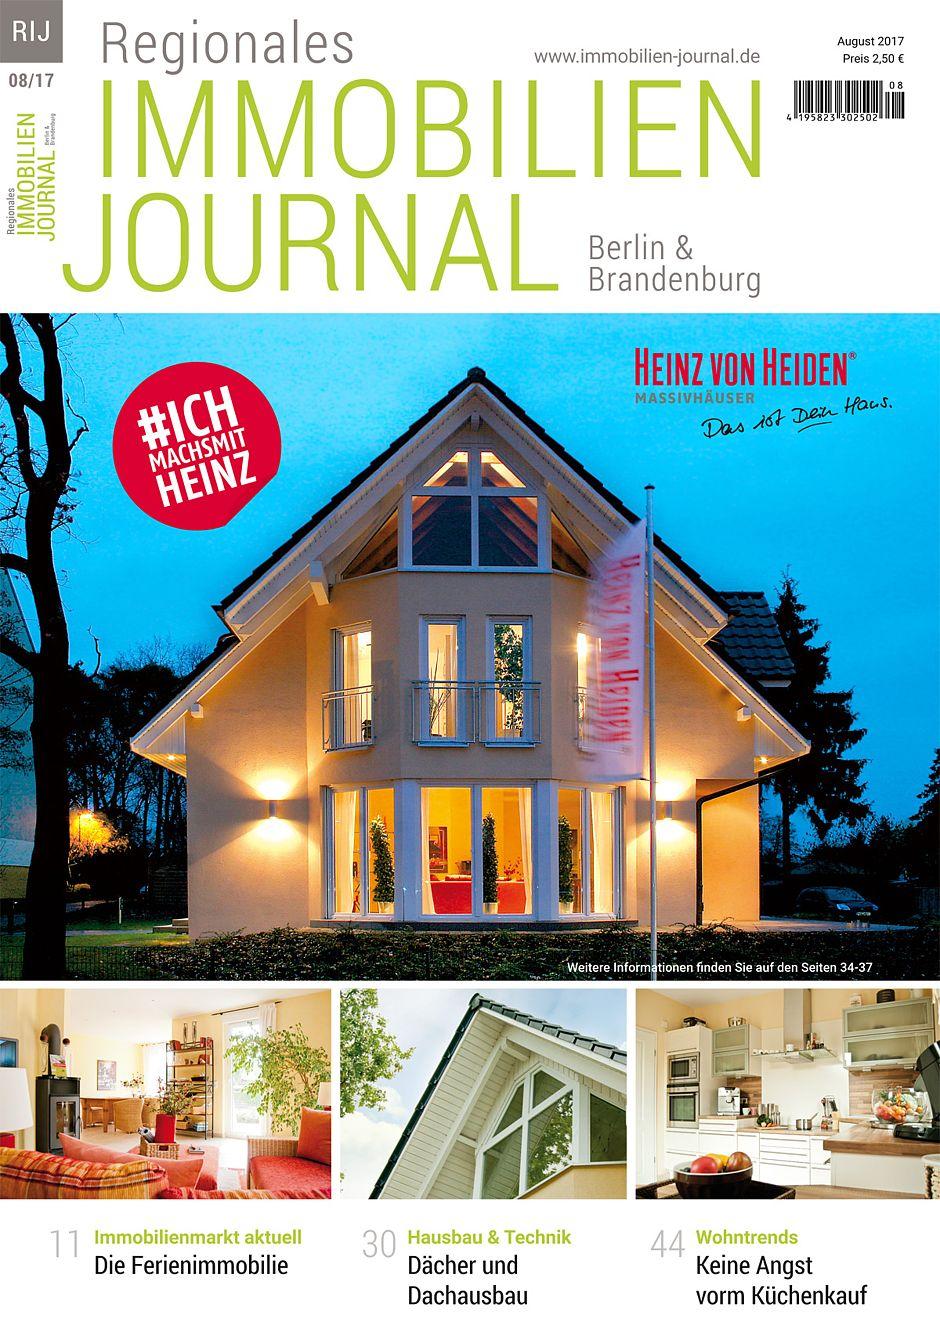 Regionales immobilien journal berlin brandenburg august for Hausbaufirmen brandenburg